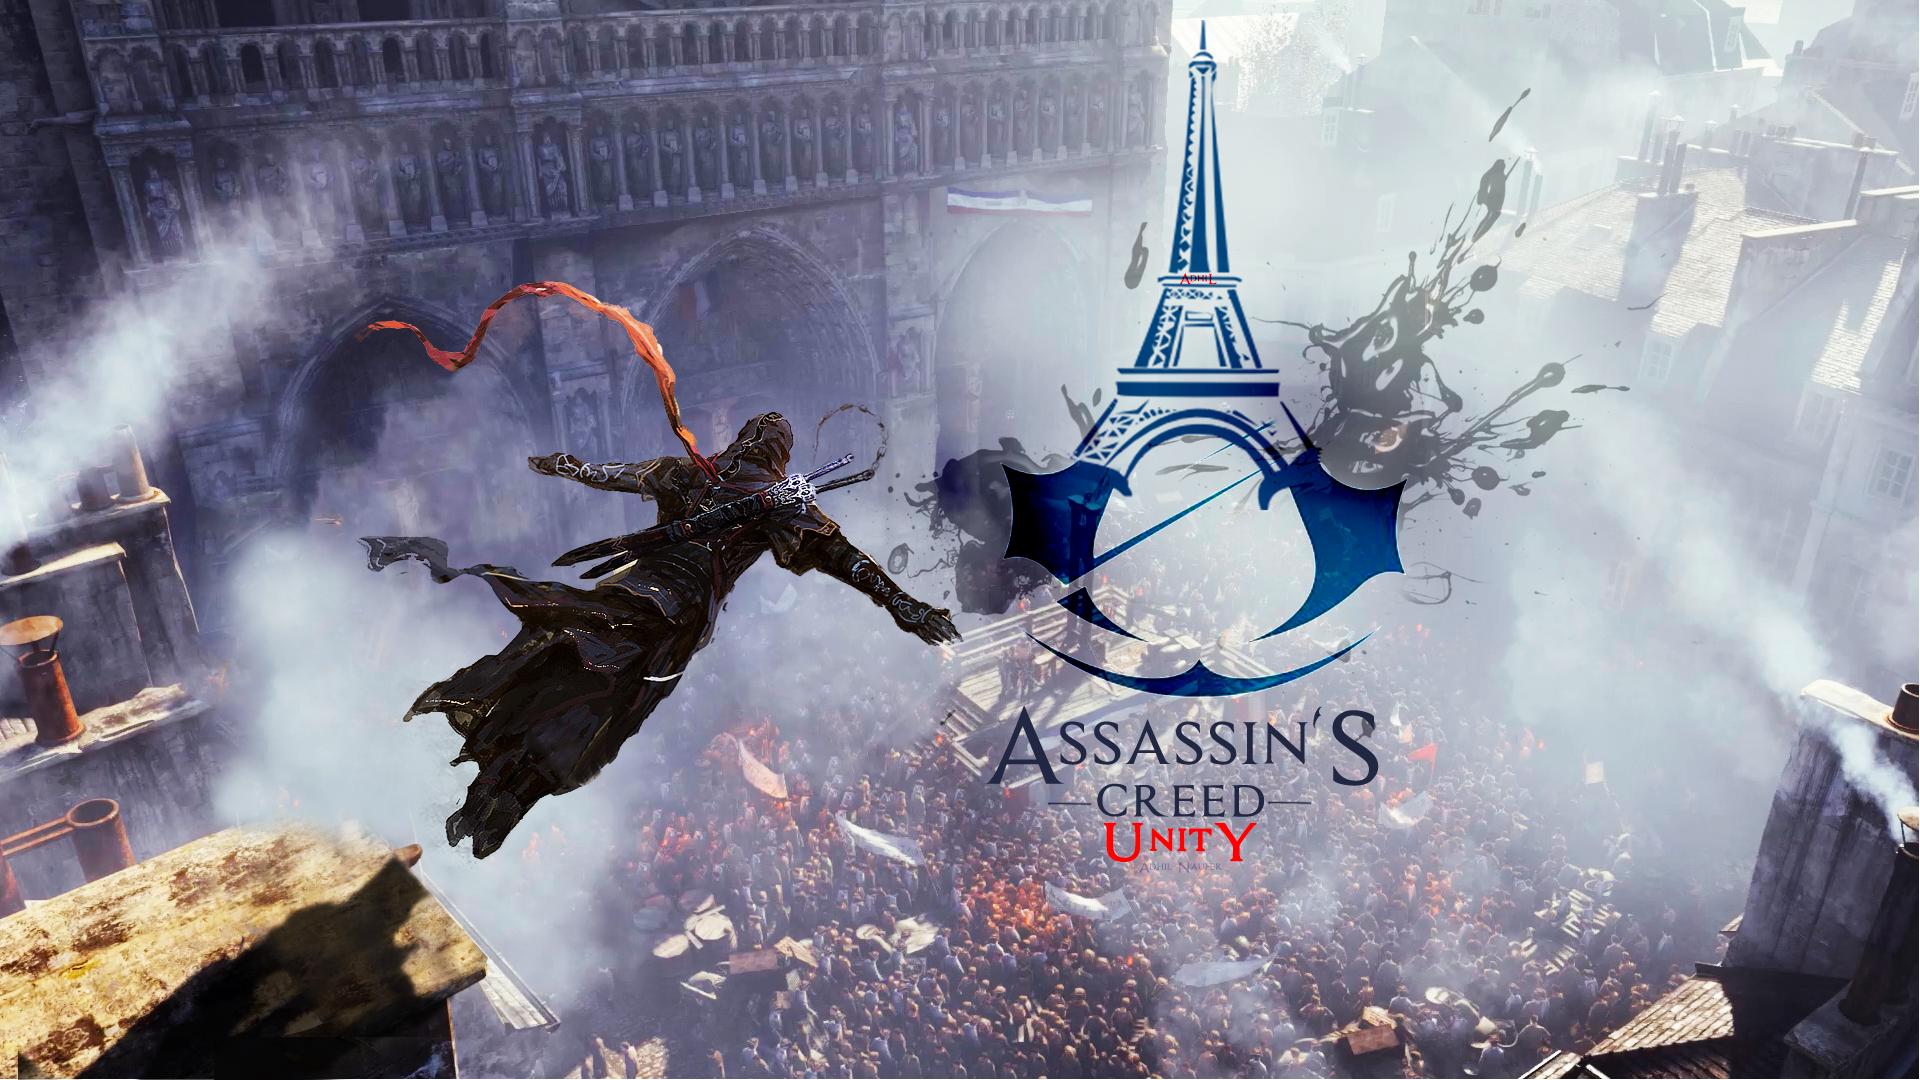 Assassins Creed Unity wallpaper 1